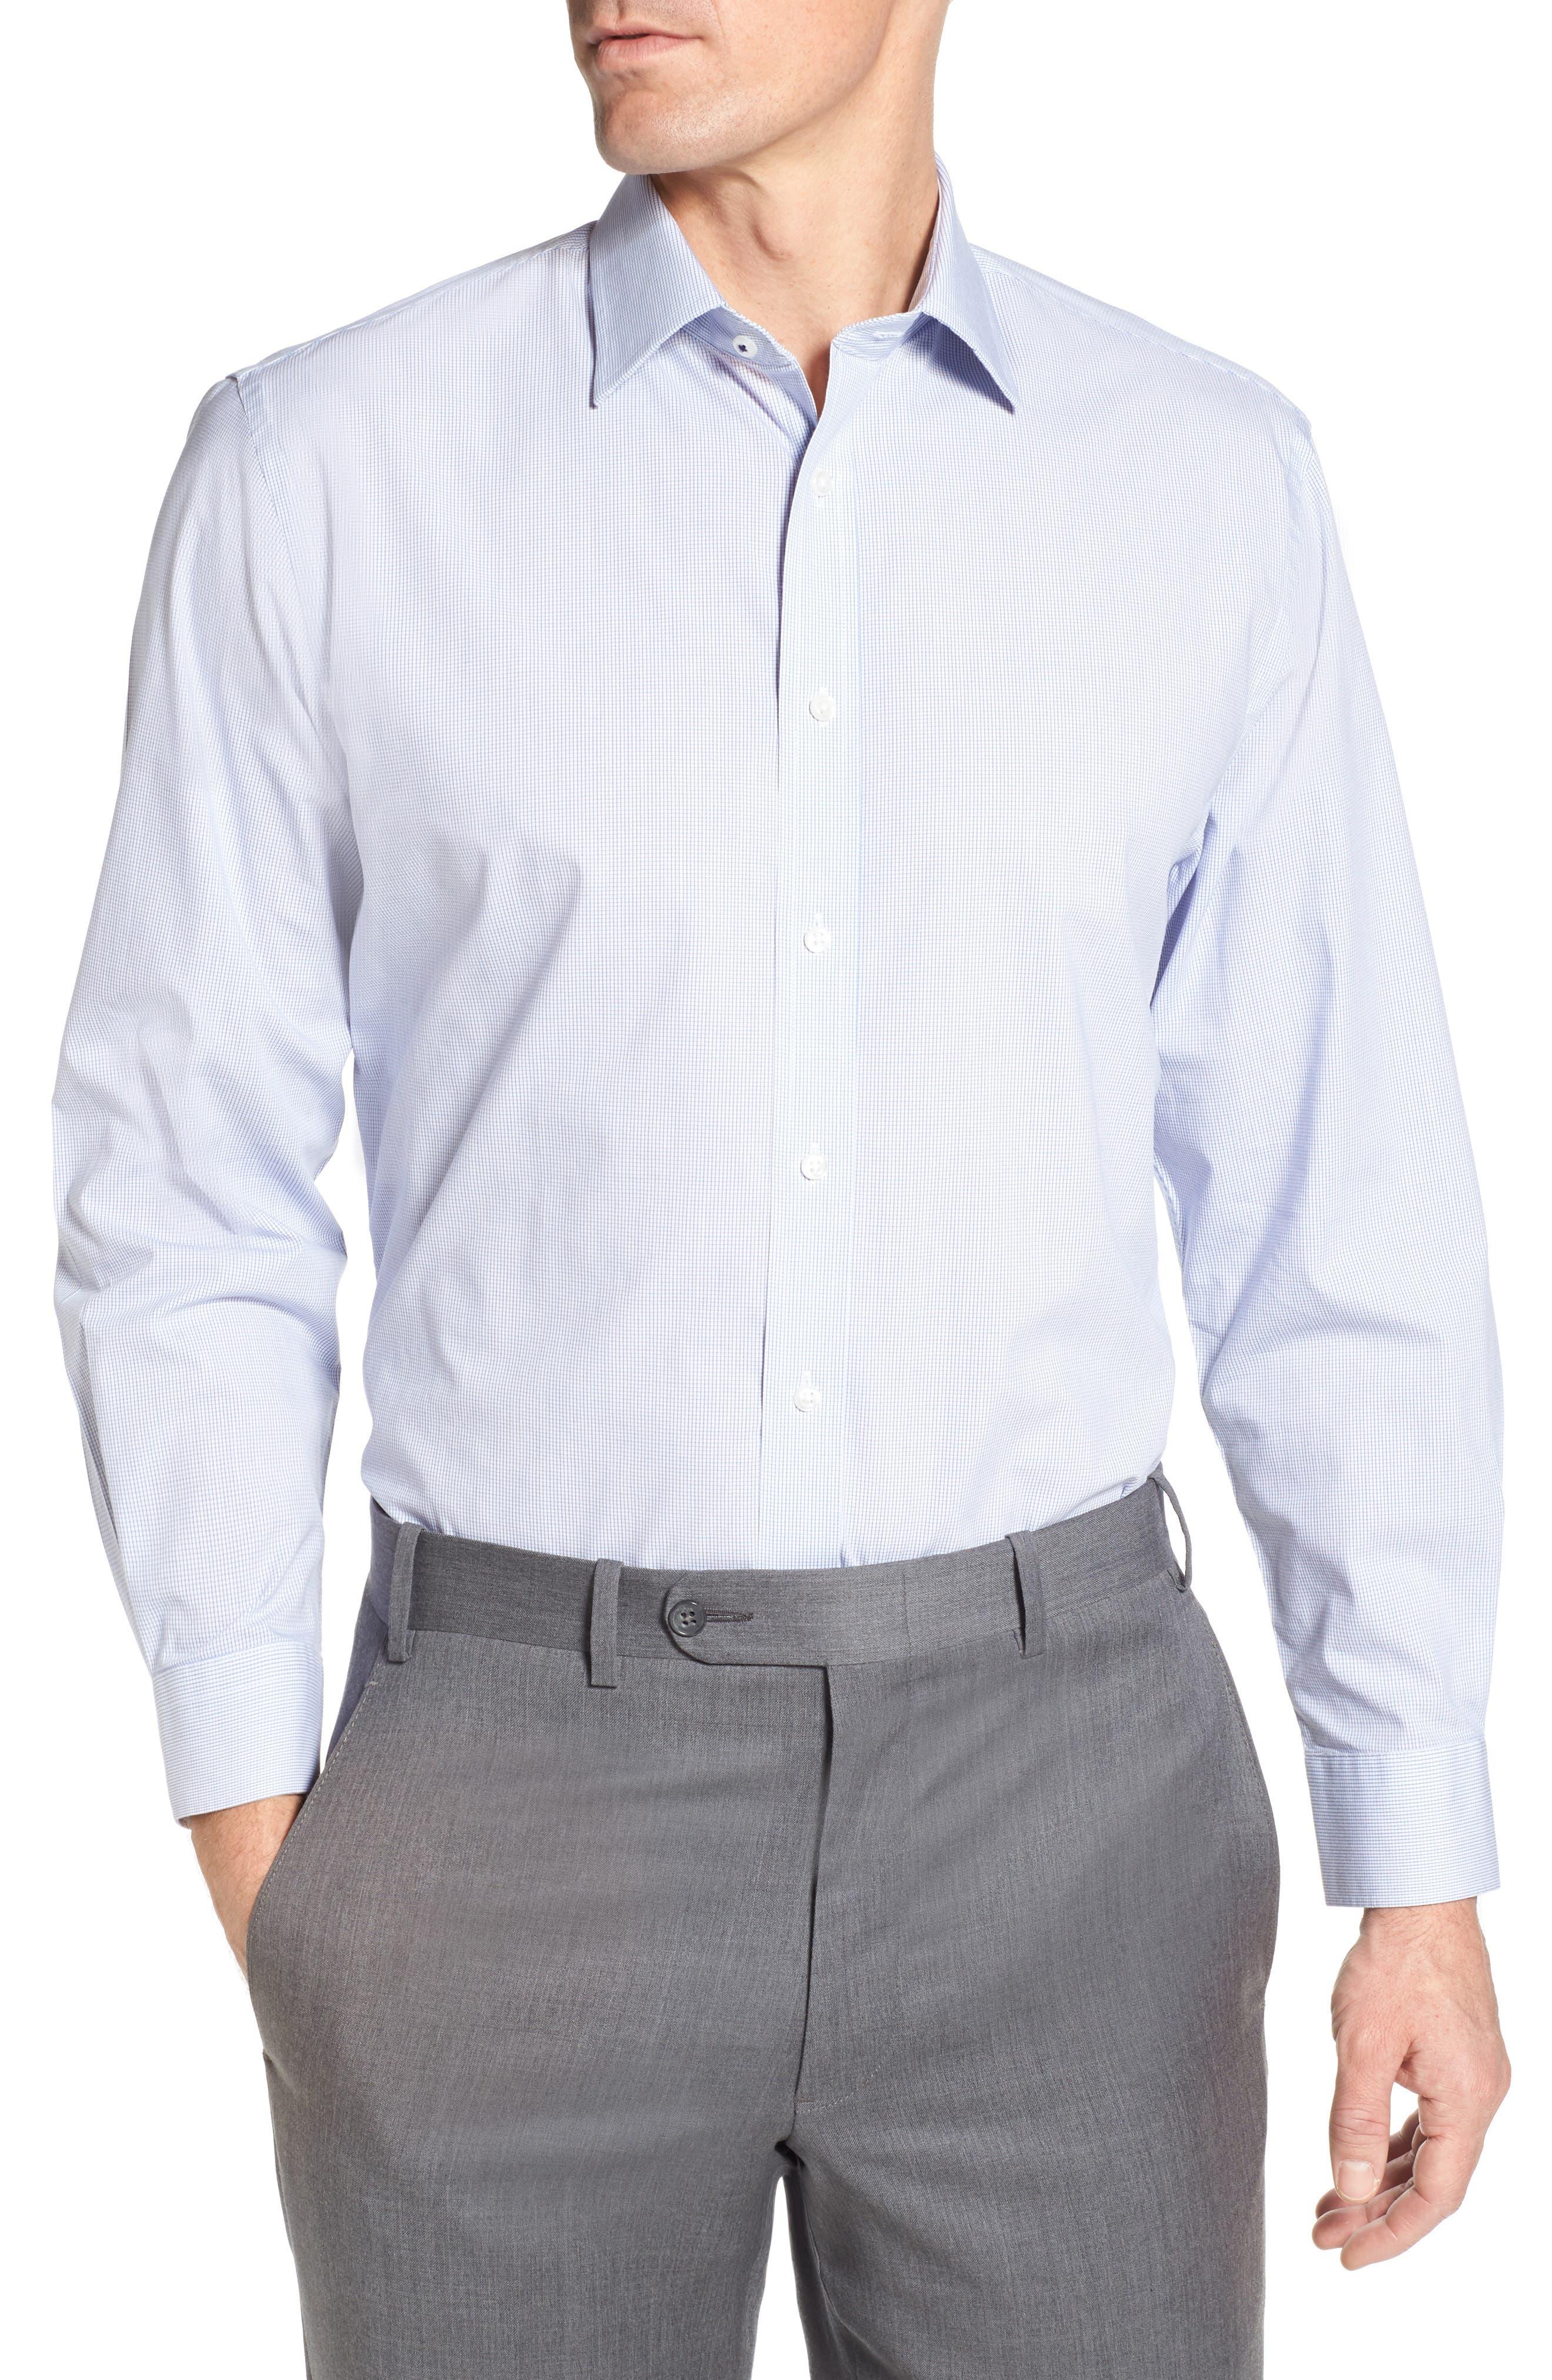 Nordstrom Men's Shop Tech-Smart Traditional Fit Microcheck Dress Shirt